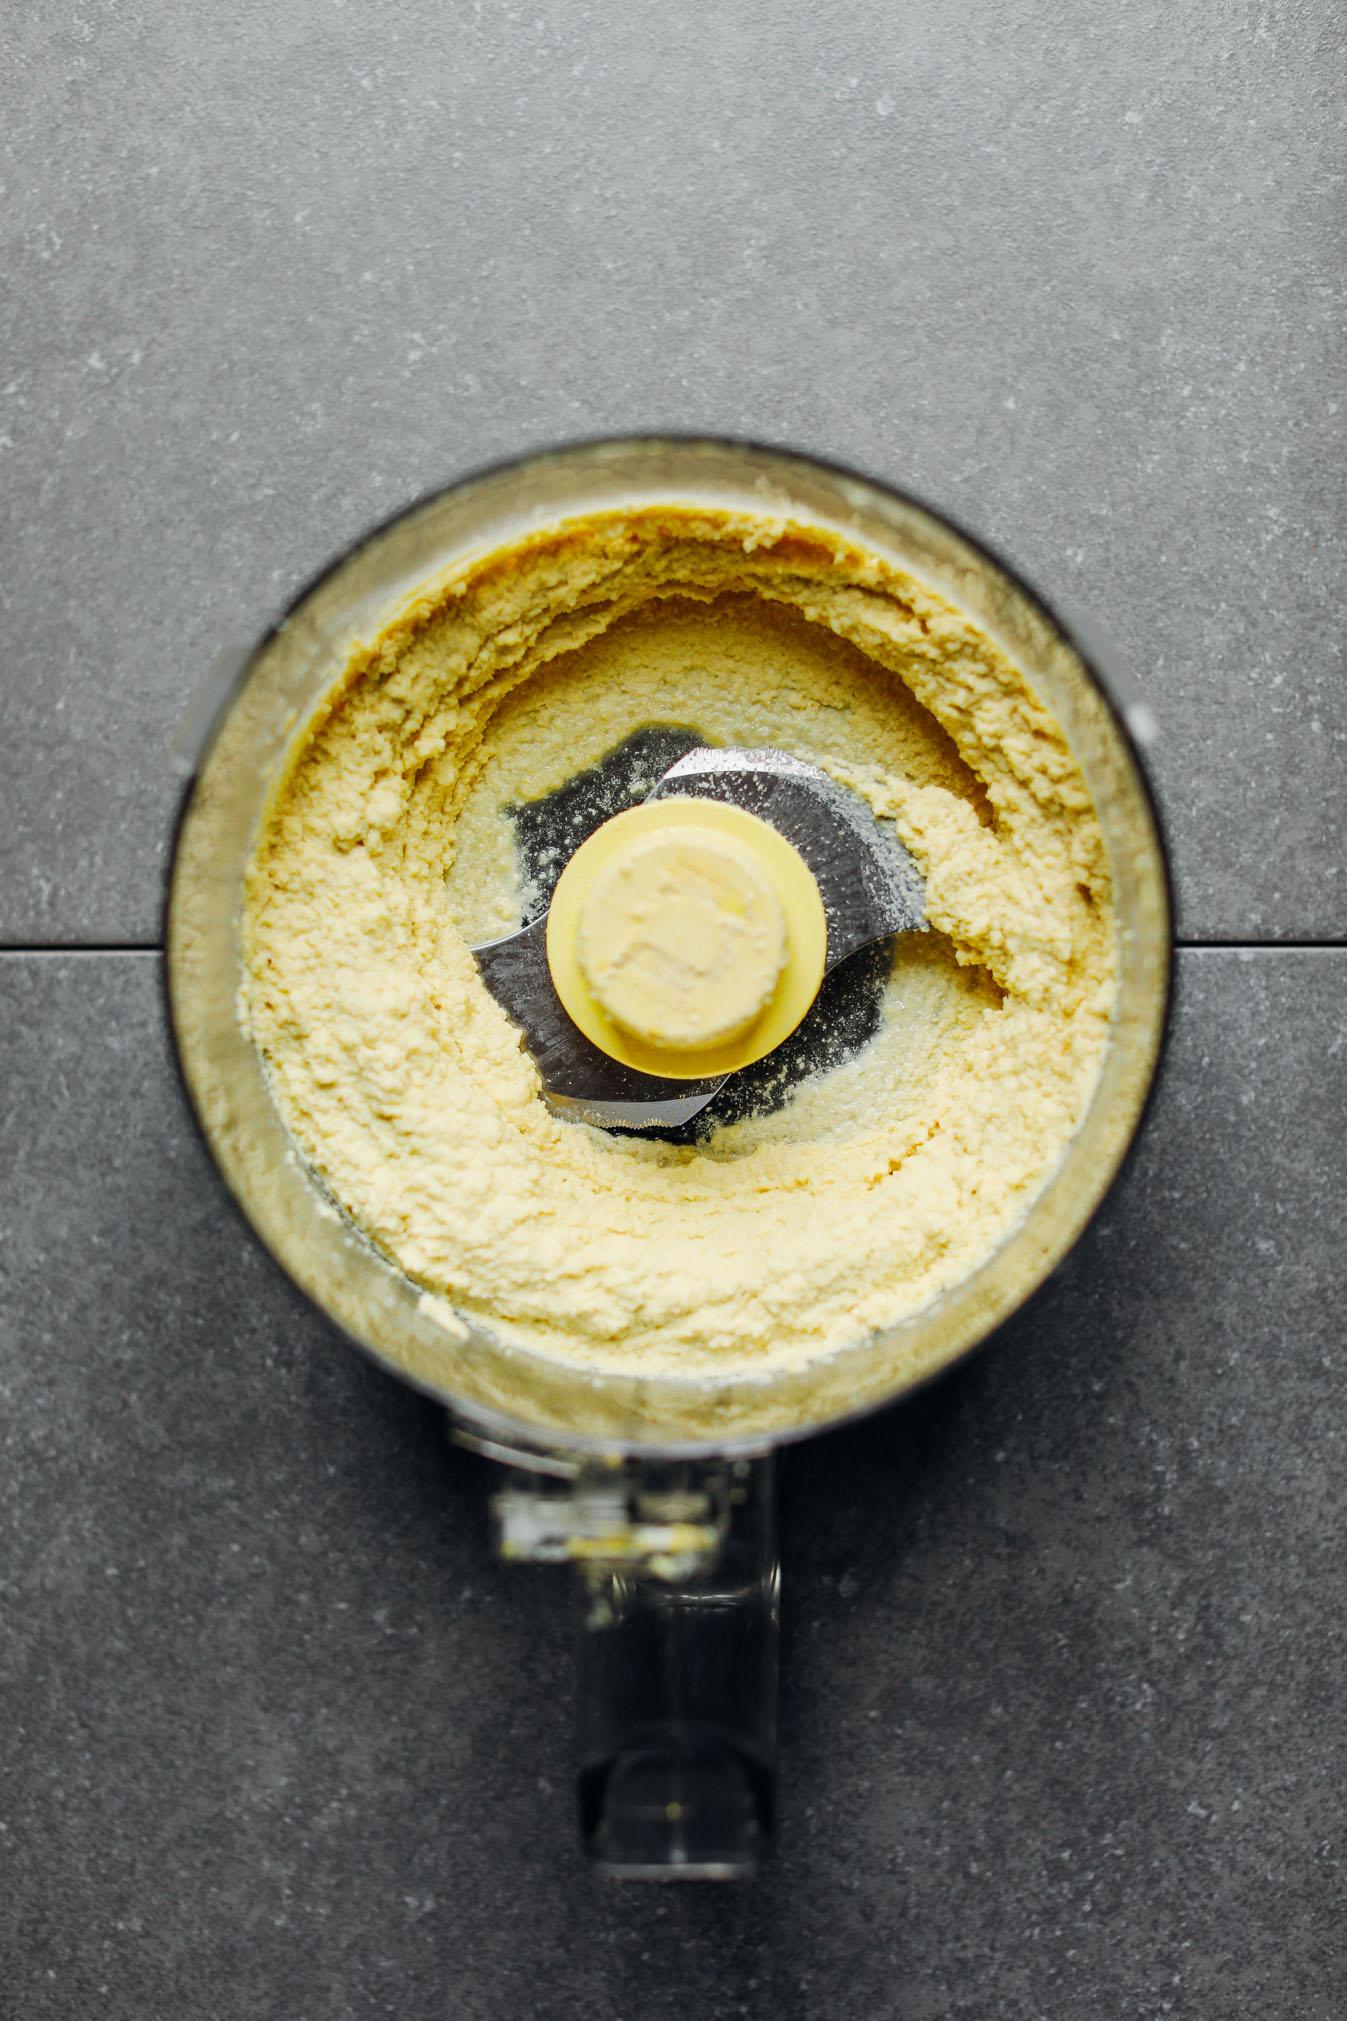 Food processor with freshly blended vegan Macadamia Nut Herb Cheese